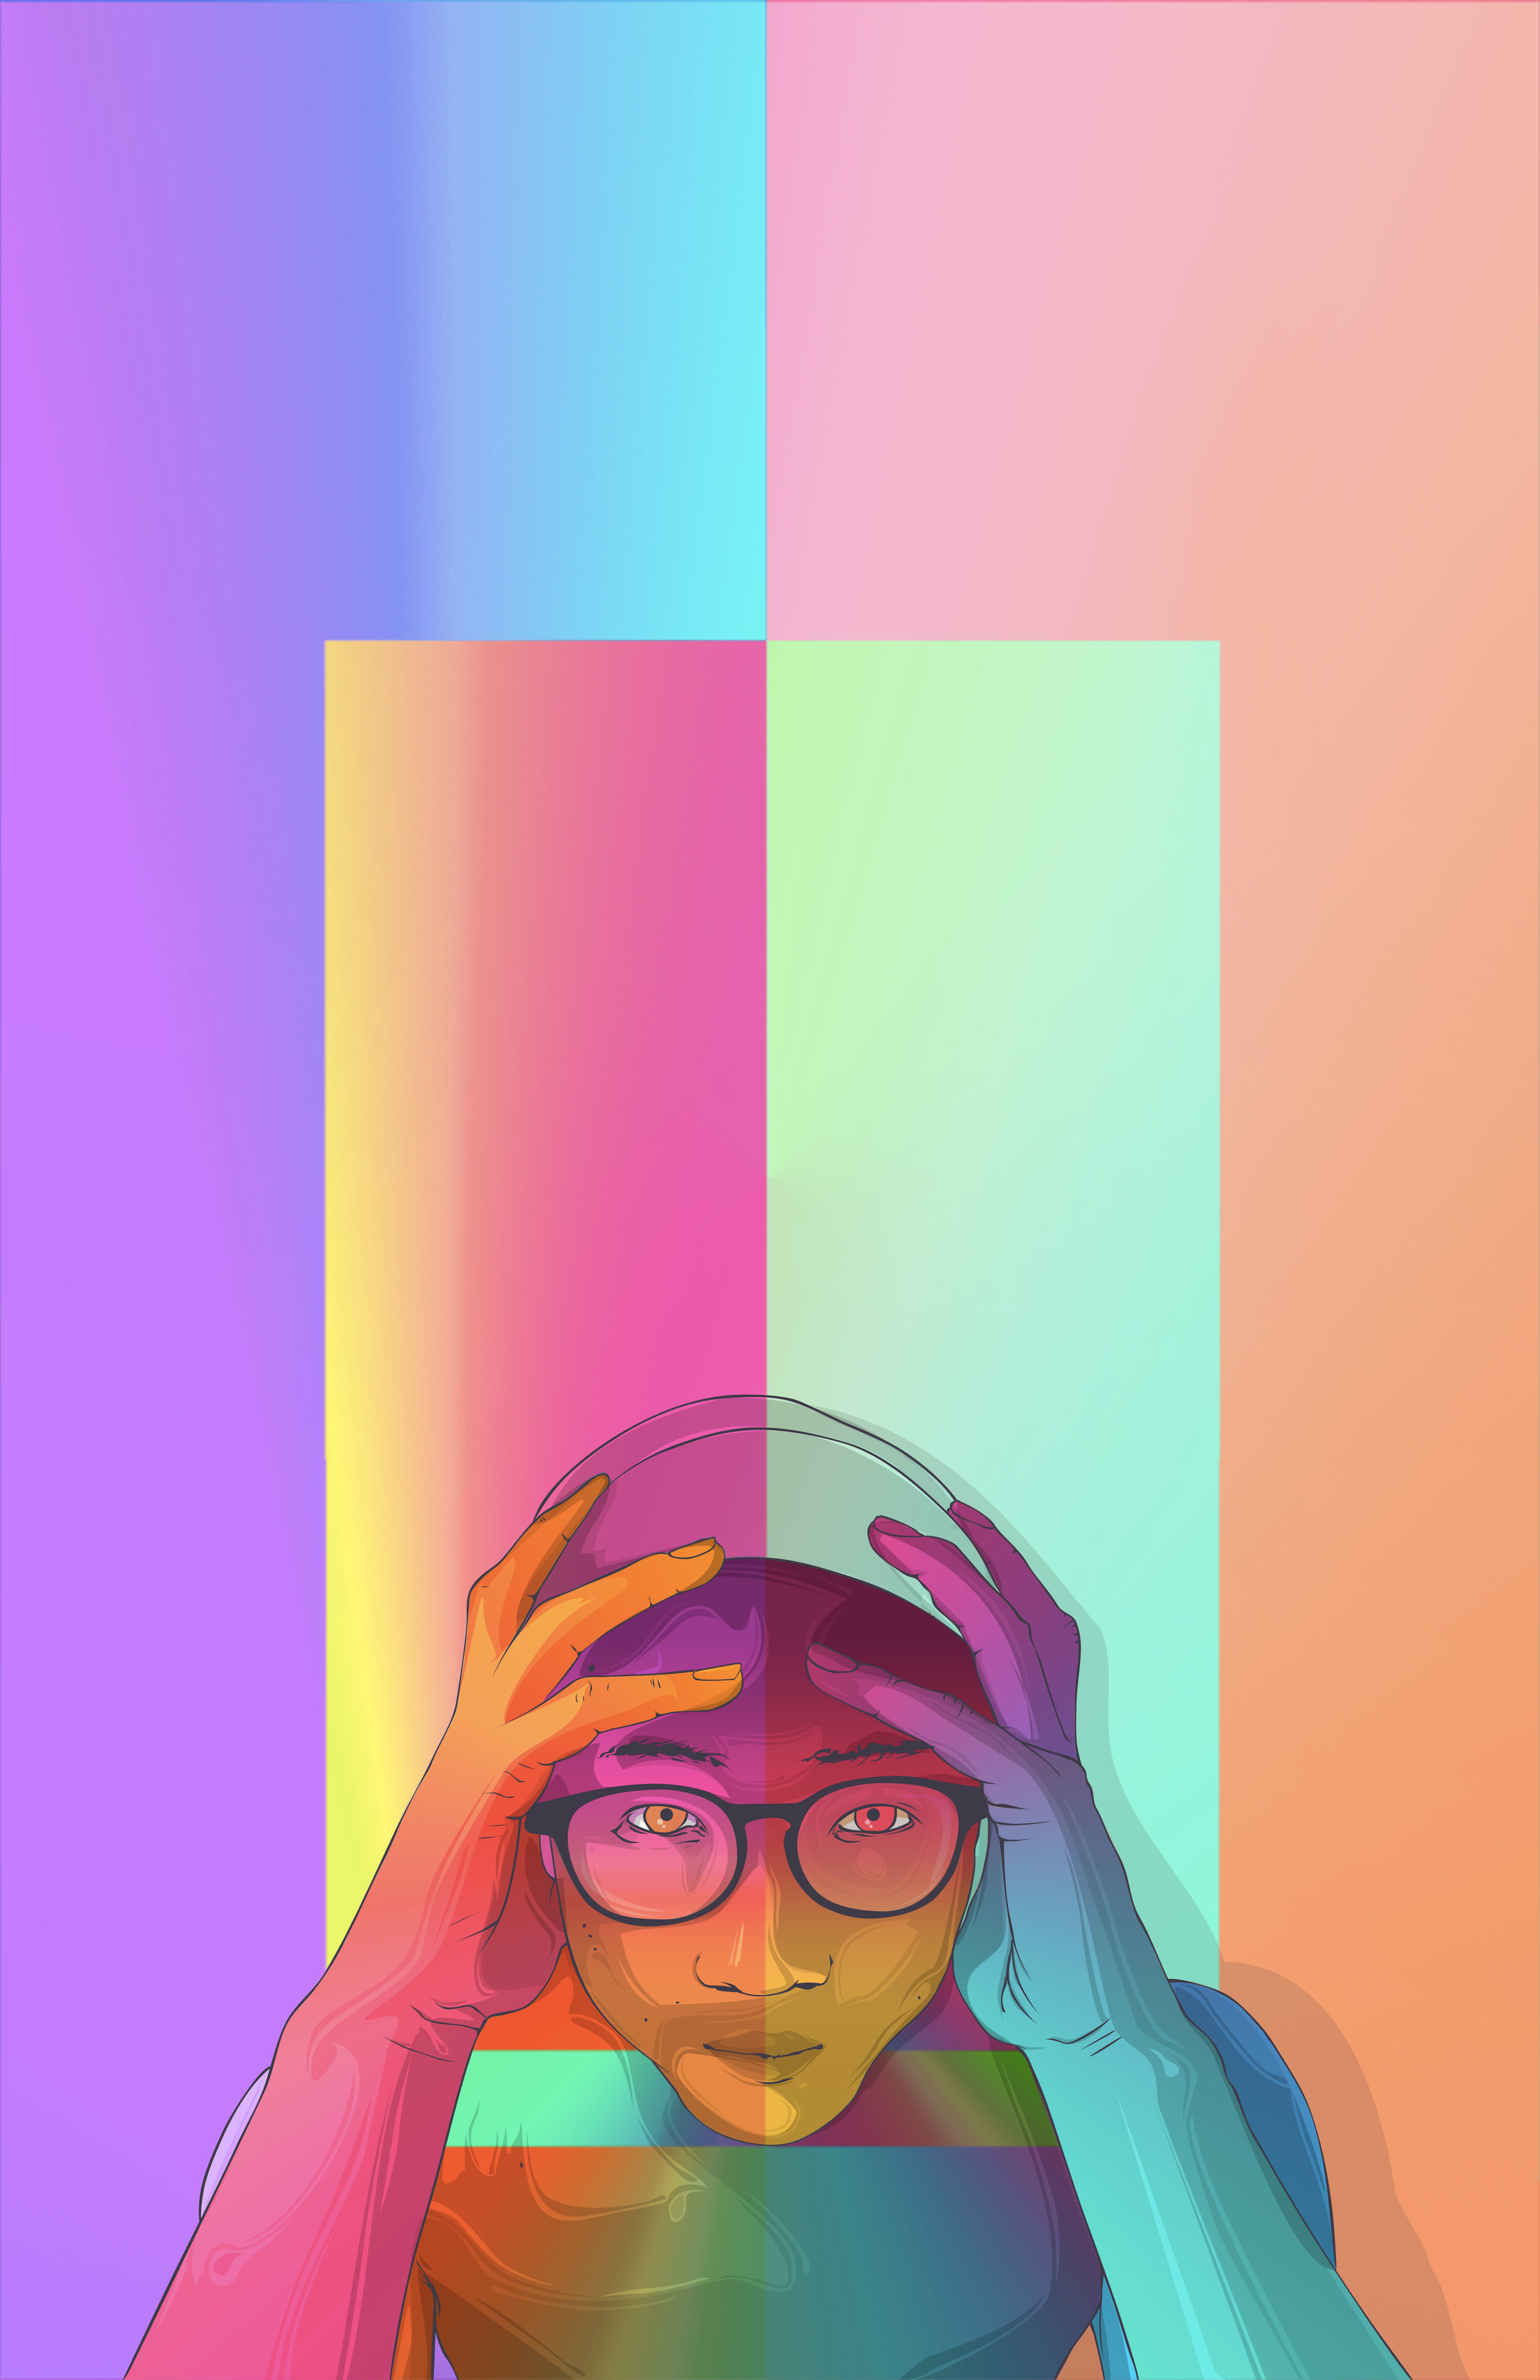 selfportrait (2015)